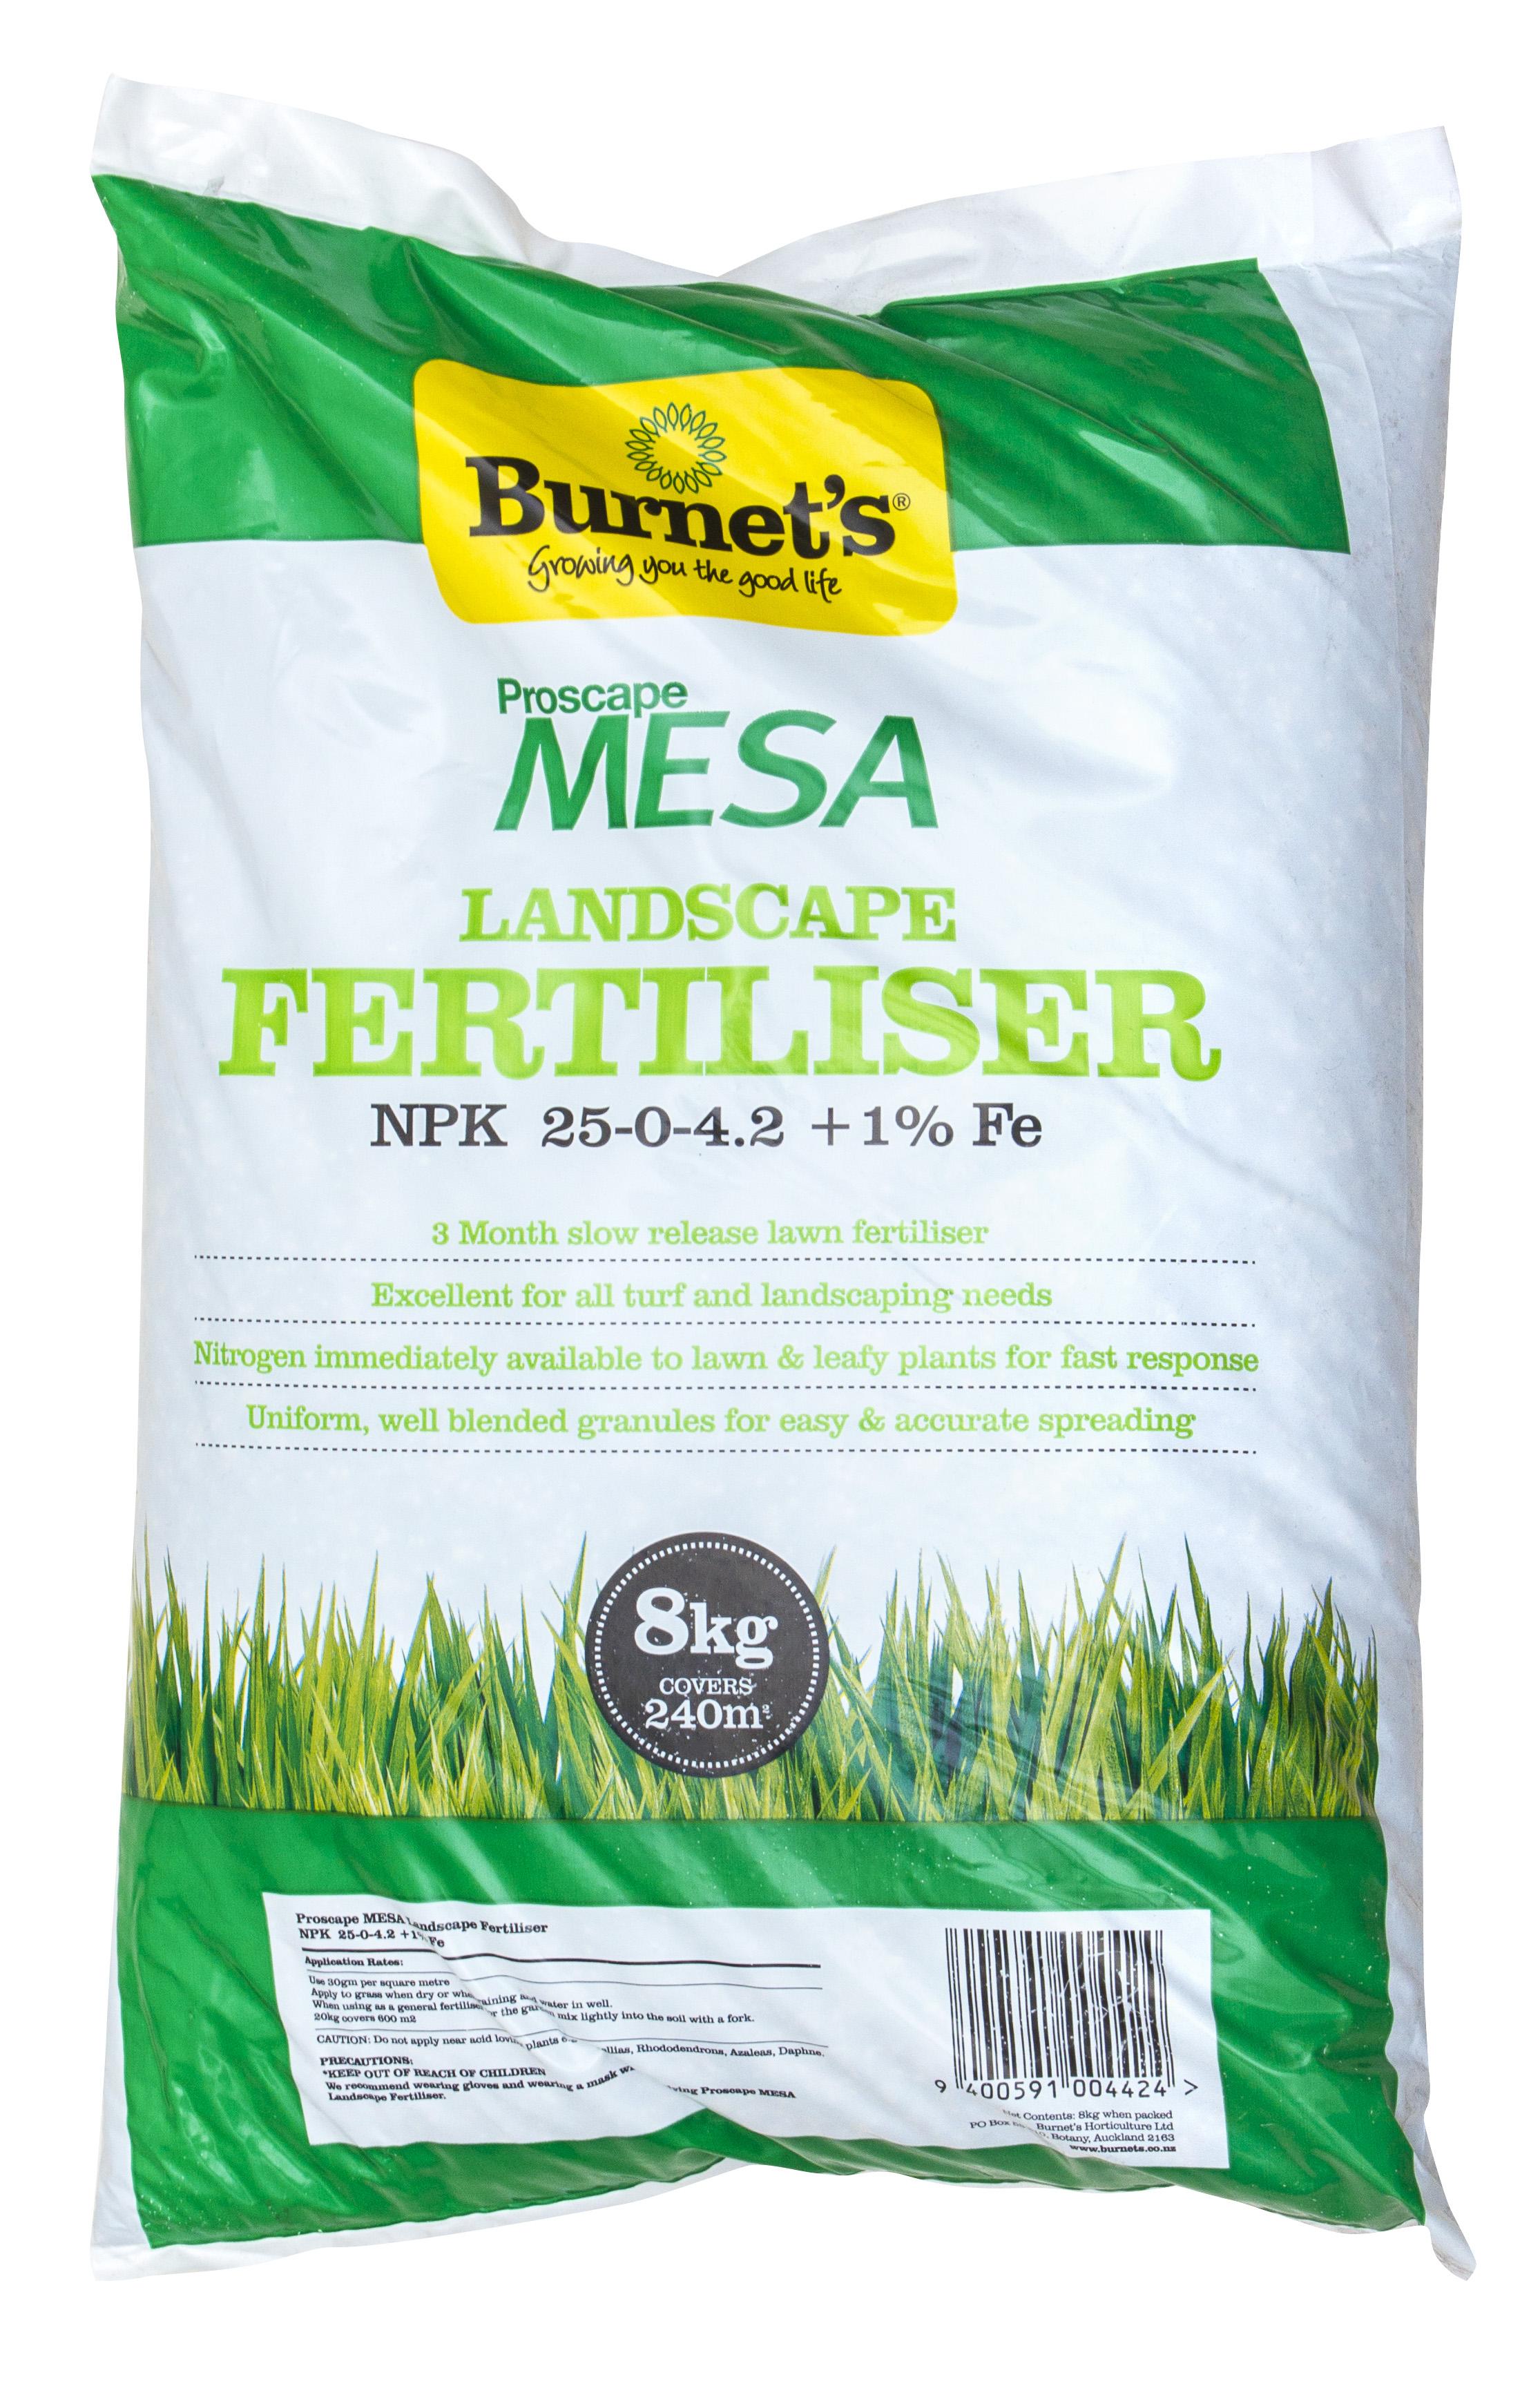 Proscape MESA Landscape Fertiliser U0026 Lawn Food 8kg